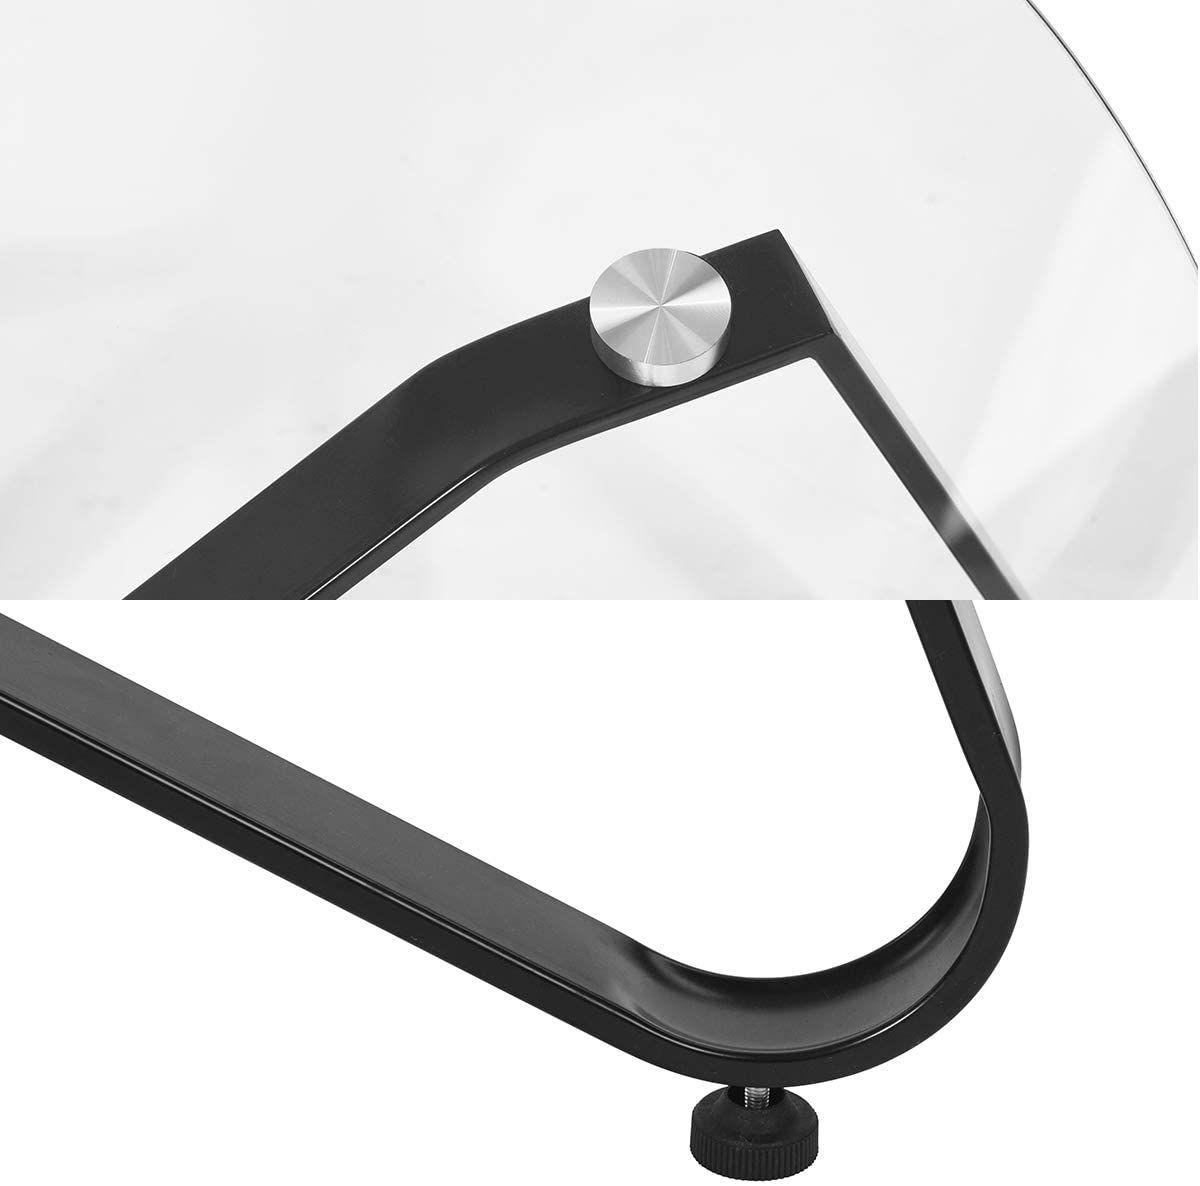 Table Basse En Verre Trempe Table De Salon Table De Canape Minimaliste Moderne In 2020 Table Design Design Habitats